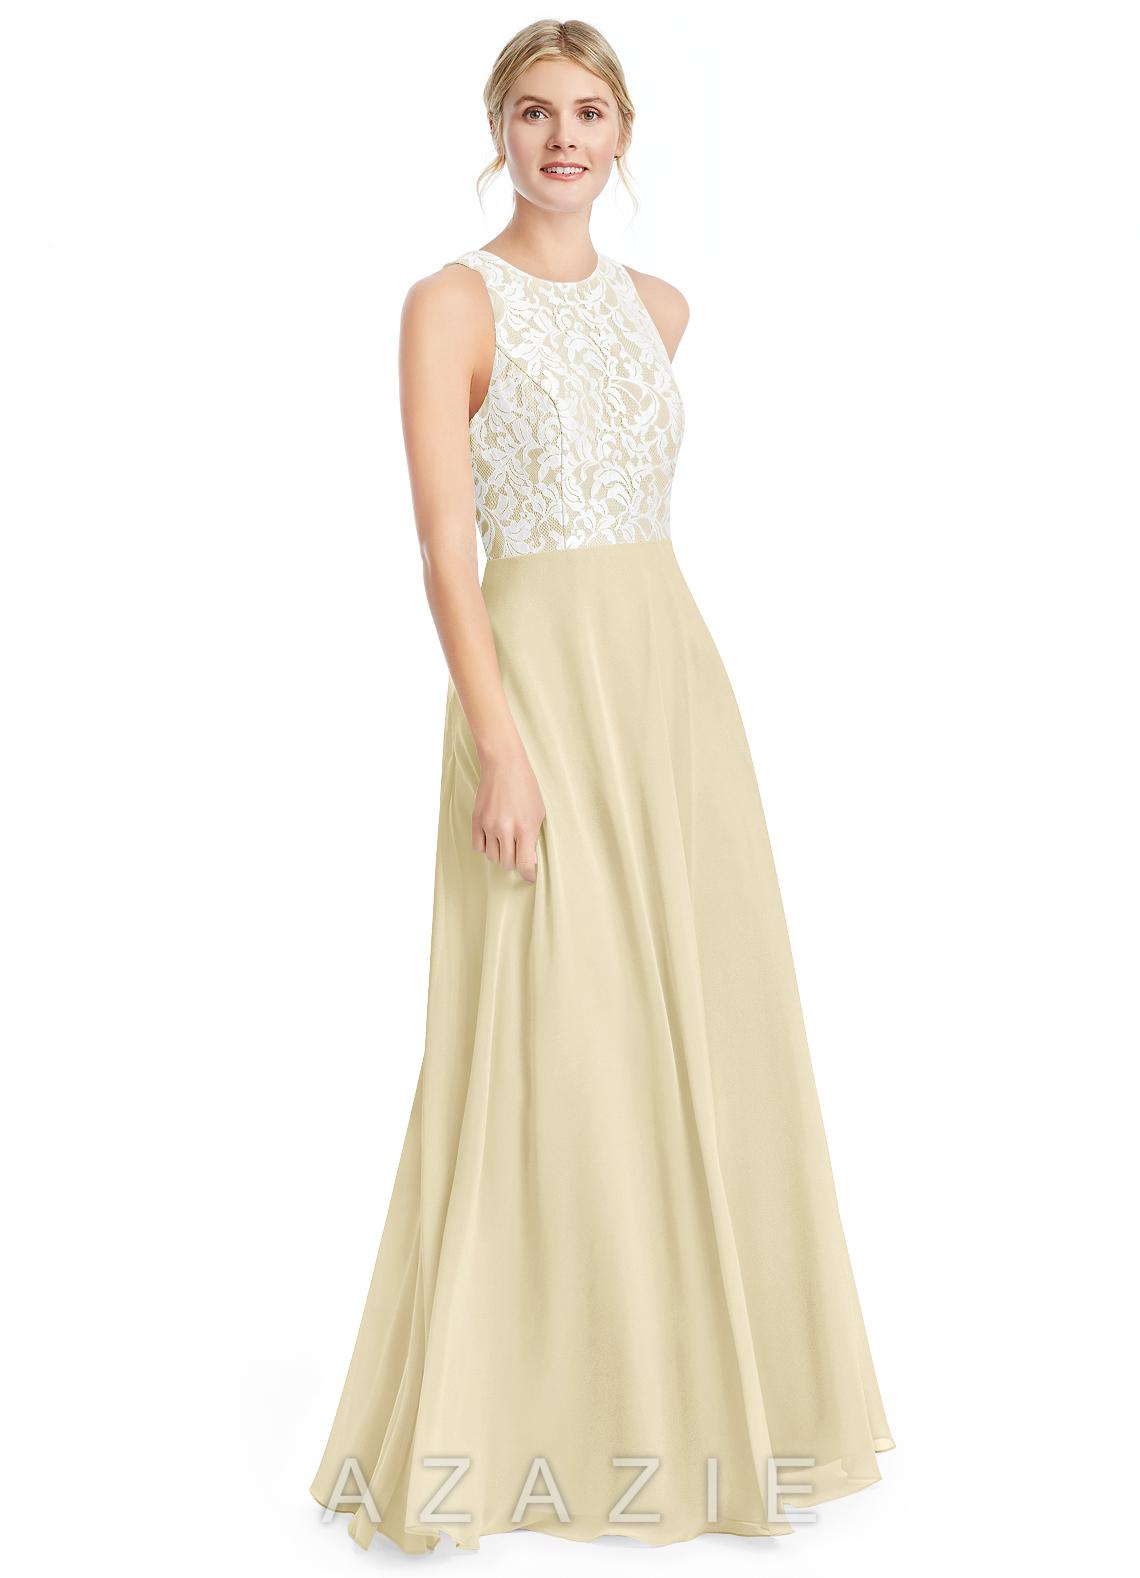 c42e1733e949 Azazie Kate Bridesmaid Dress - Champagne